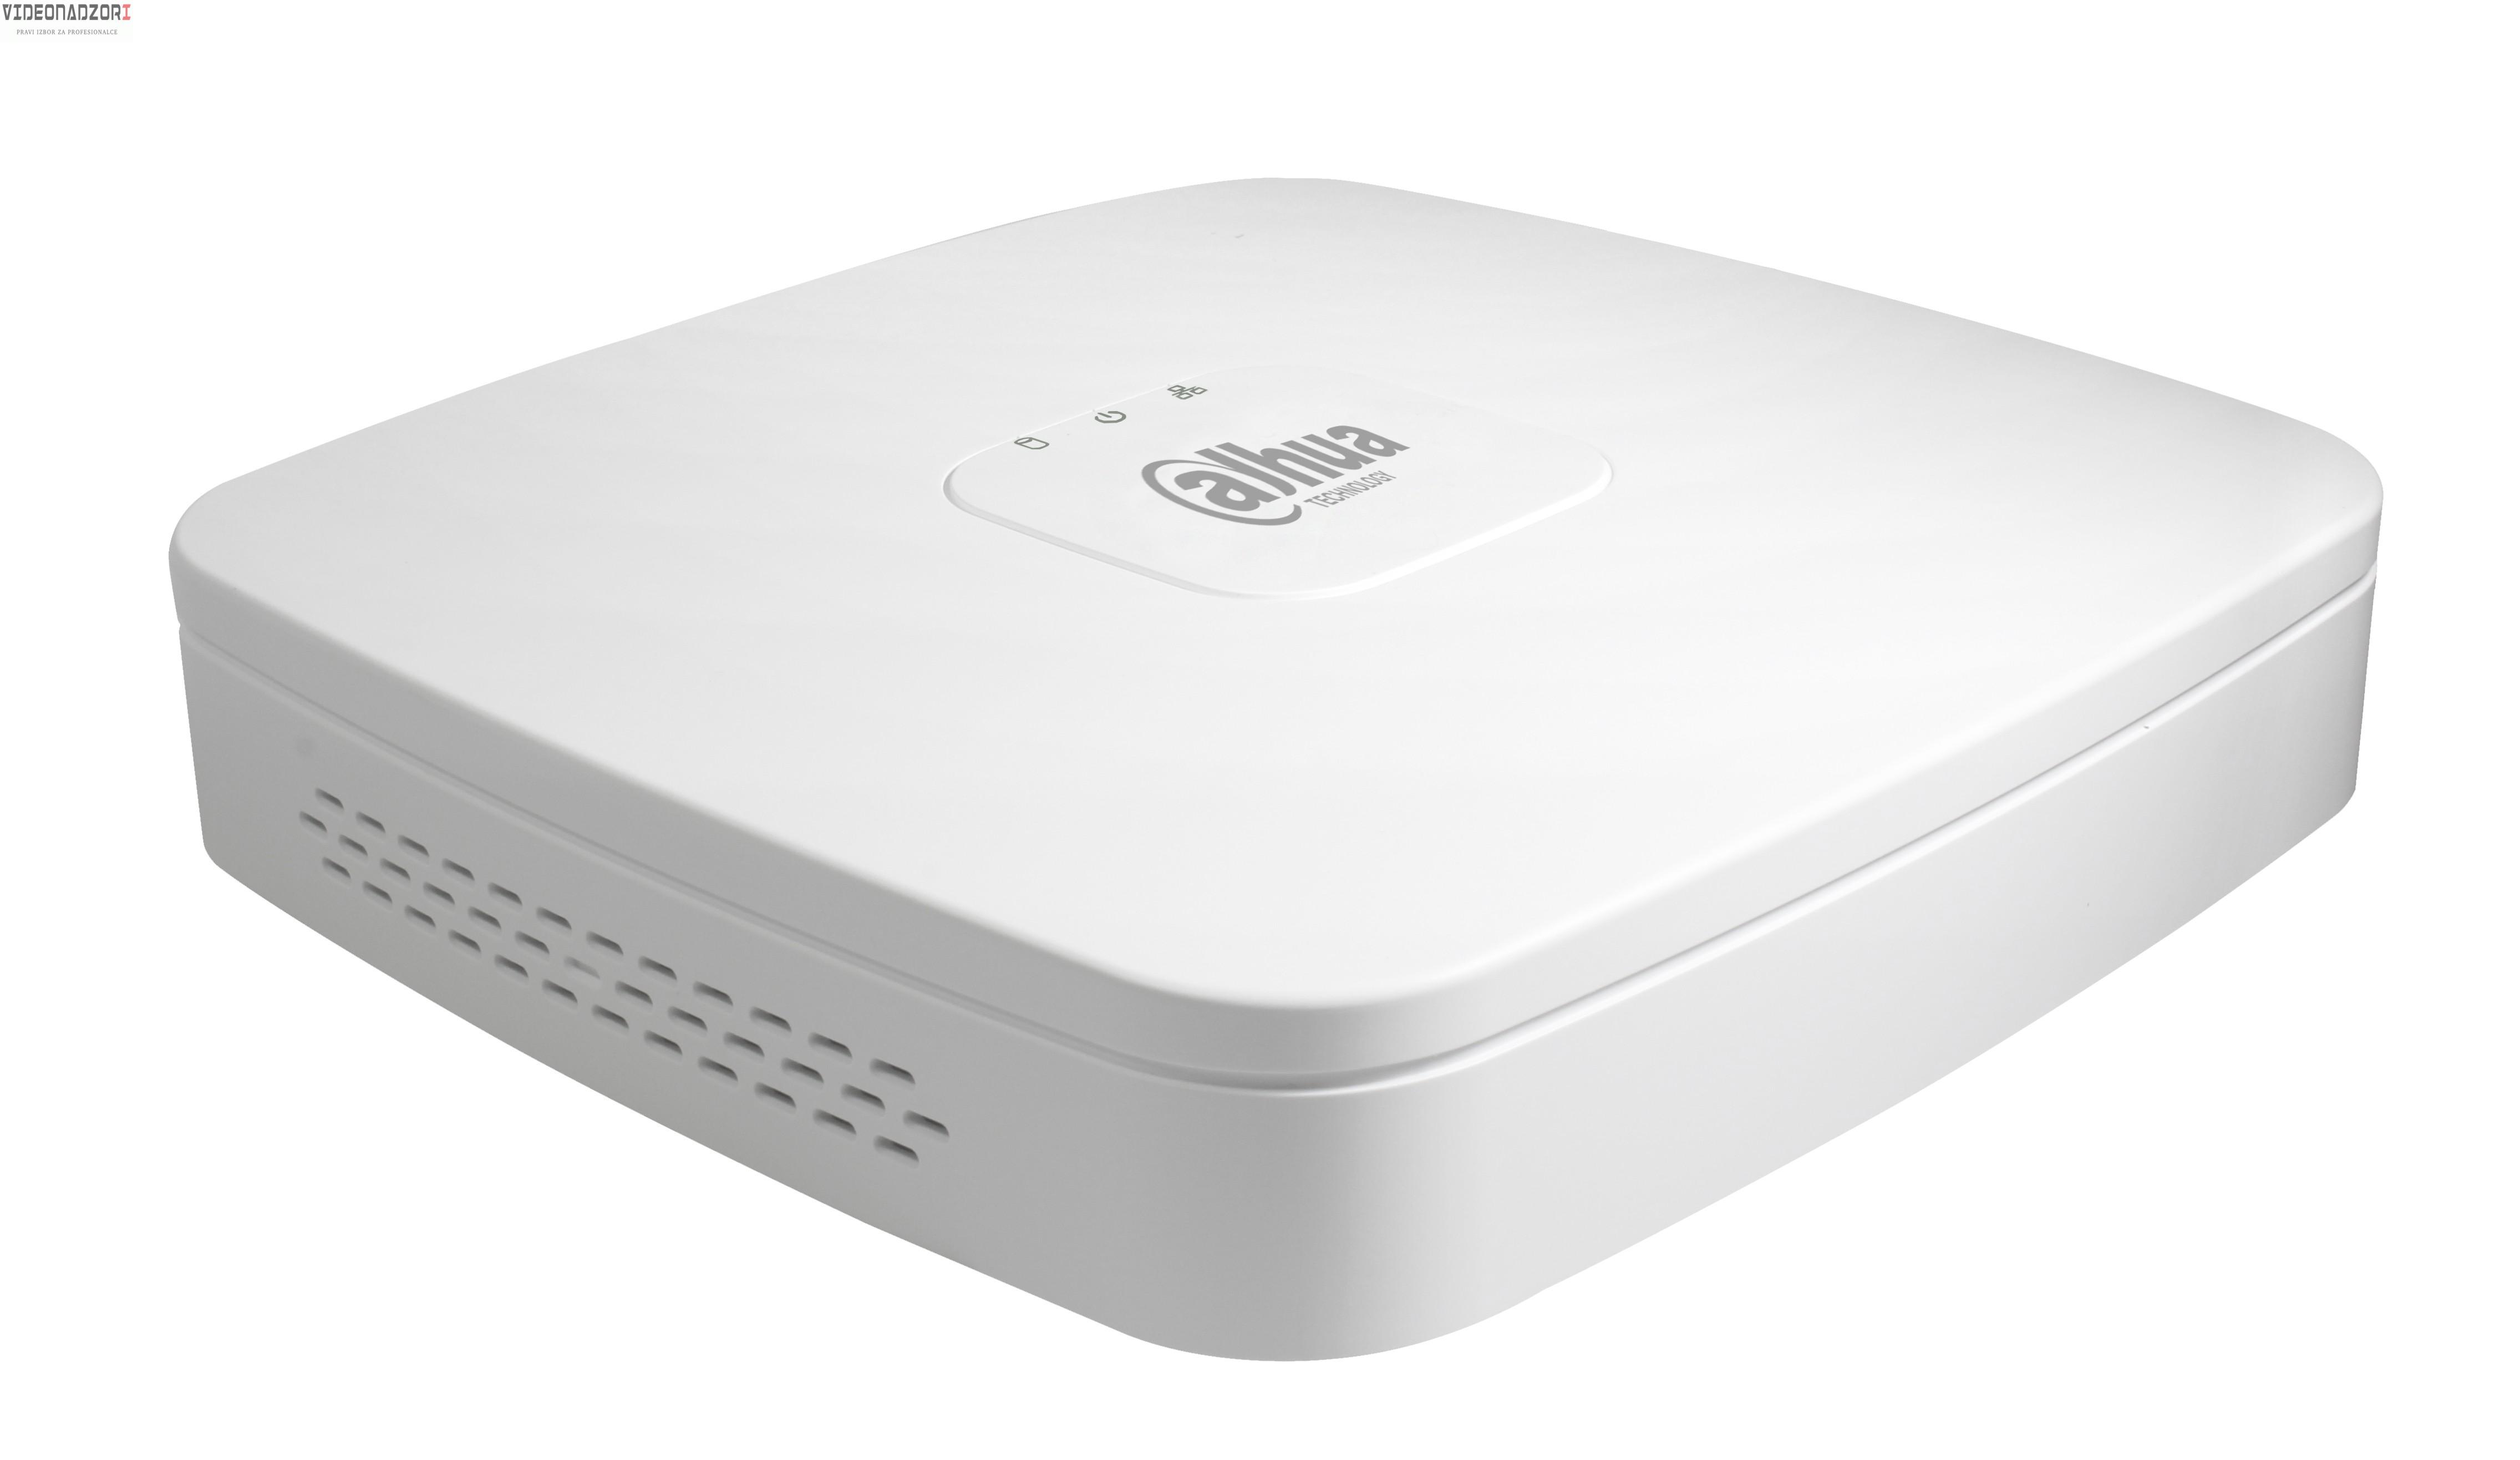 Dahua video snimac 8 kanalni hibrid HCVR-5108C-V2 od  za samo 1.248,75kn